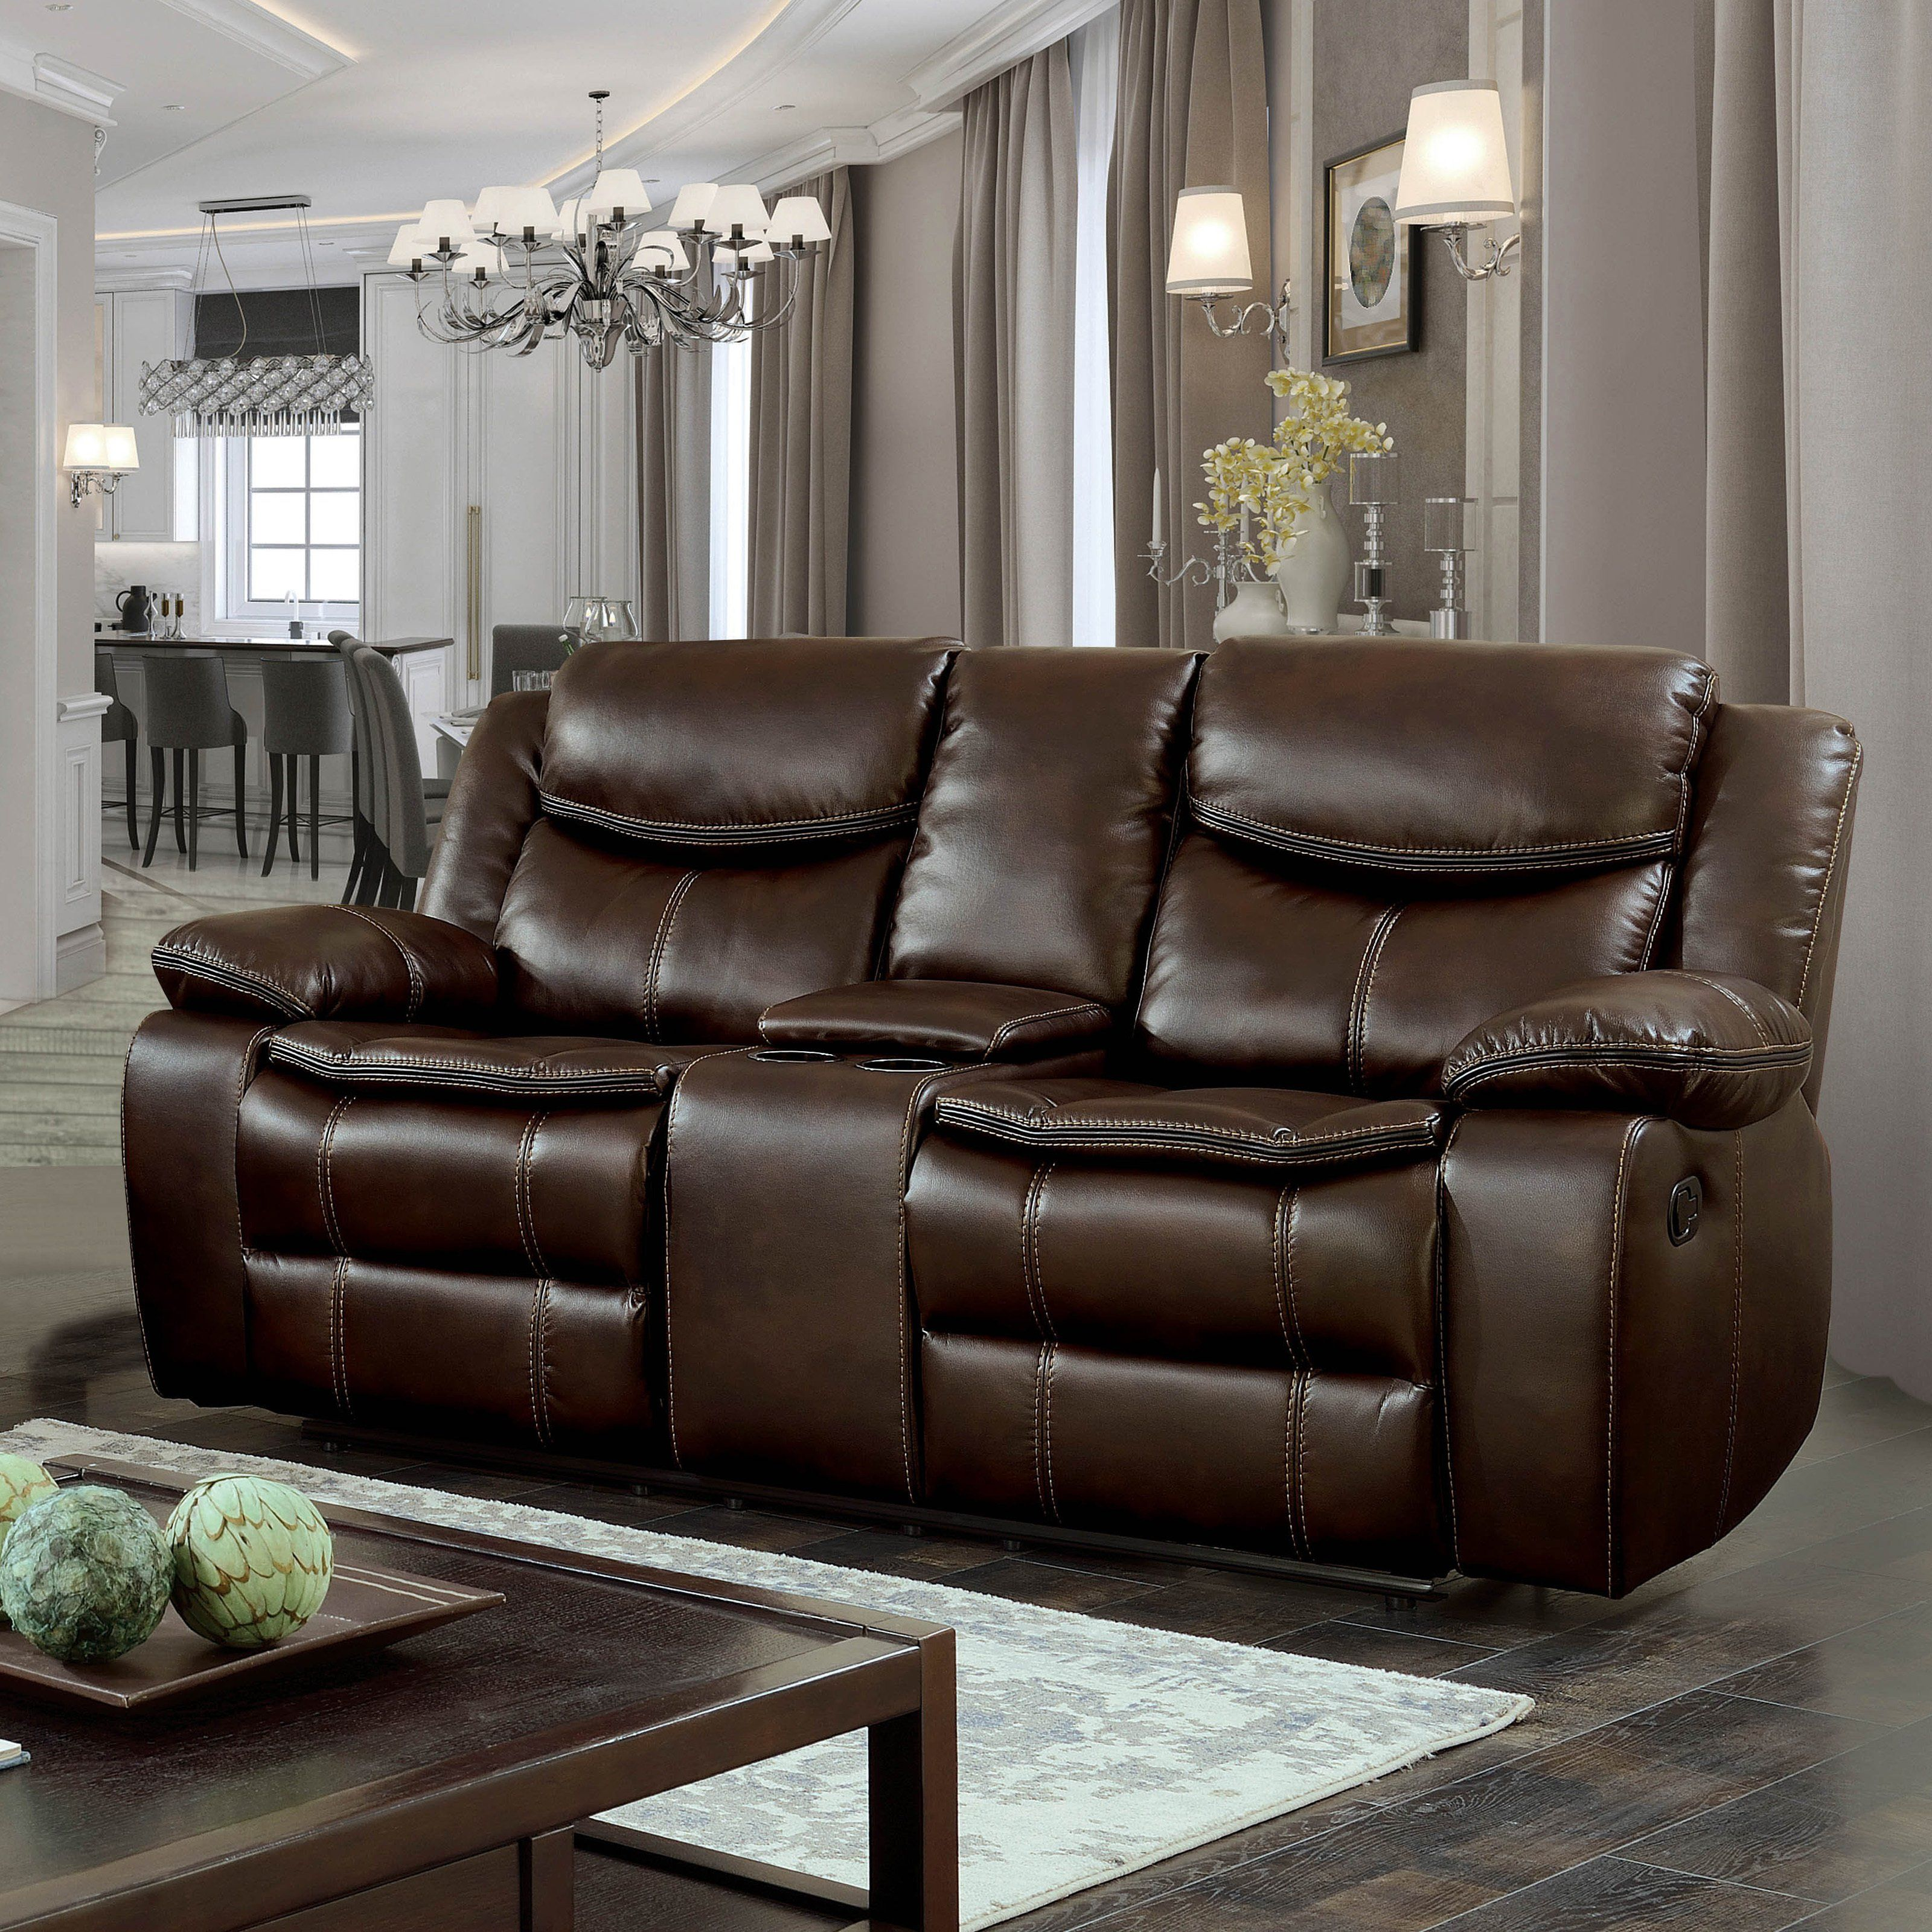 Fabulous Furniture Of America Barron Breathable Leatherette Loveseat Machost Co Dining Chair Design Ideas Machostcouk